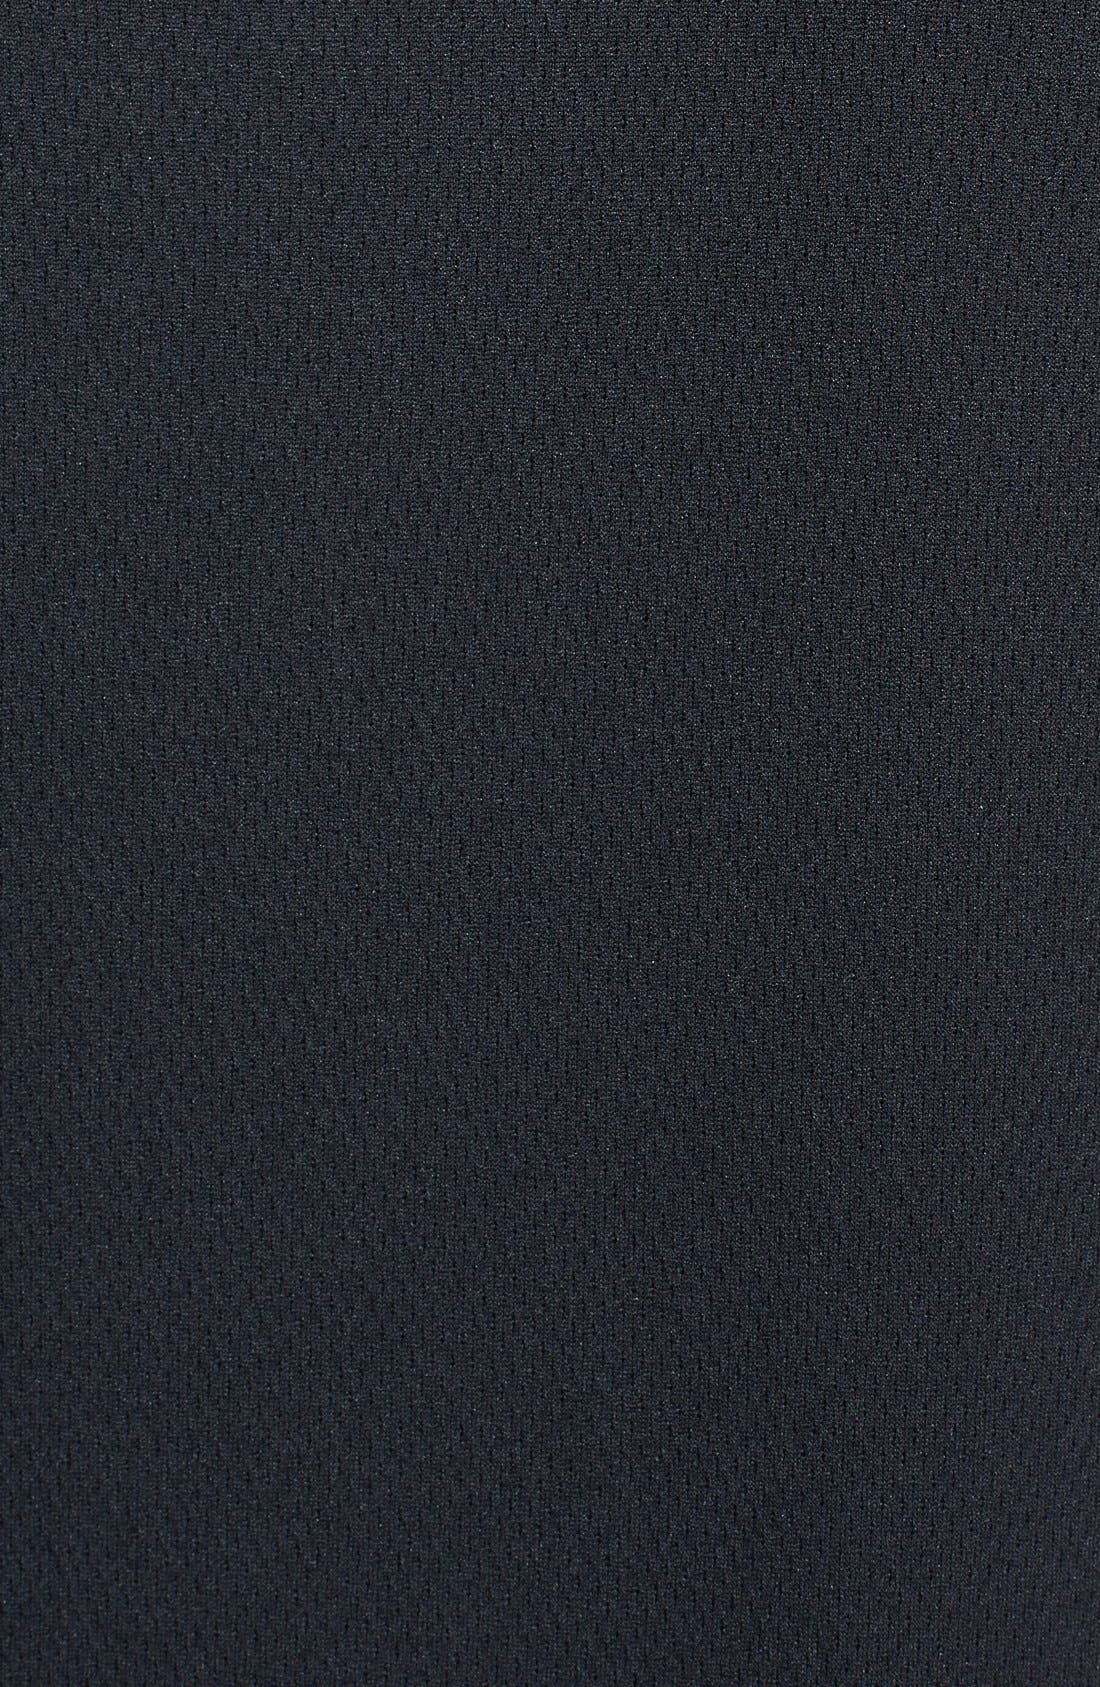 Oakland Raiders - Edge DryTec Moisture Wicking Half Zip Pullover,                             Alternate thumbnail 3, color,                             001